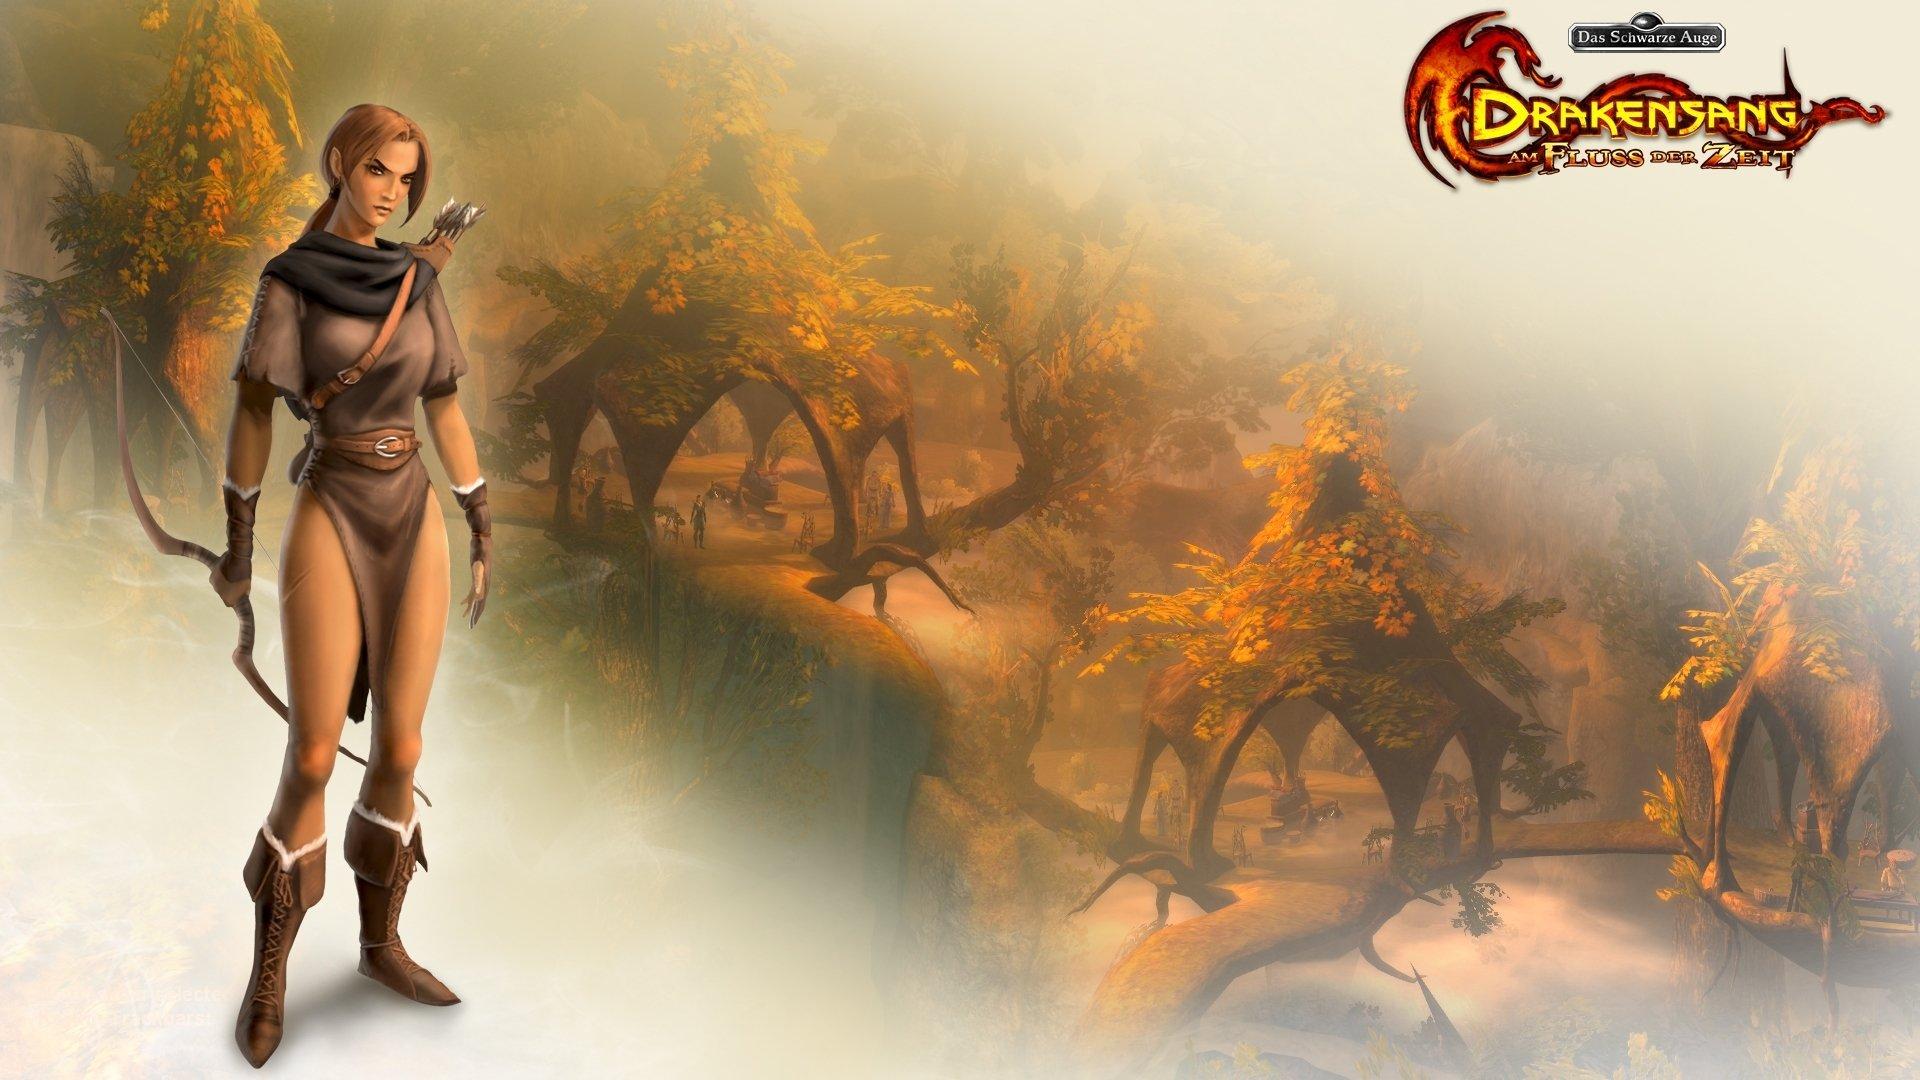 Drakensang Online HD Wallpaper | Background Image ...  Drakensang Onli...